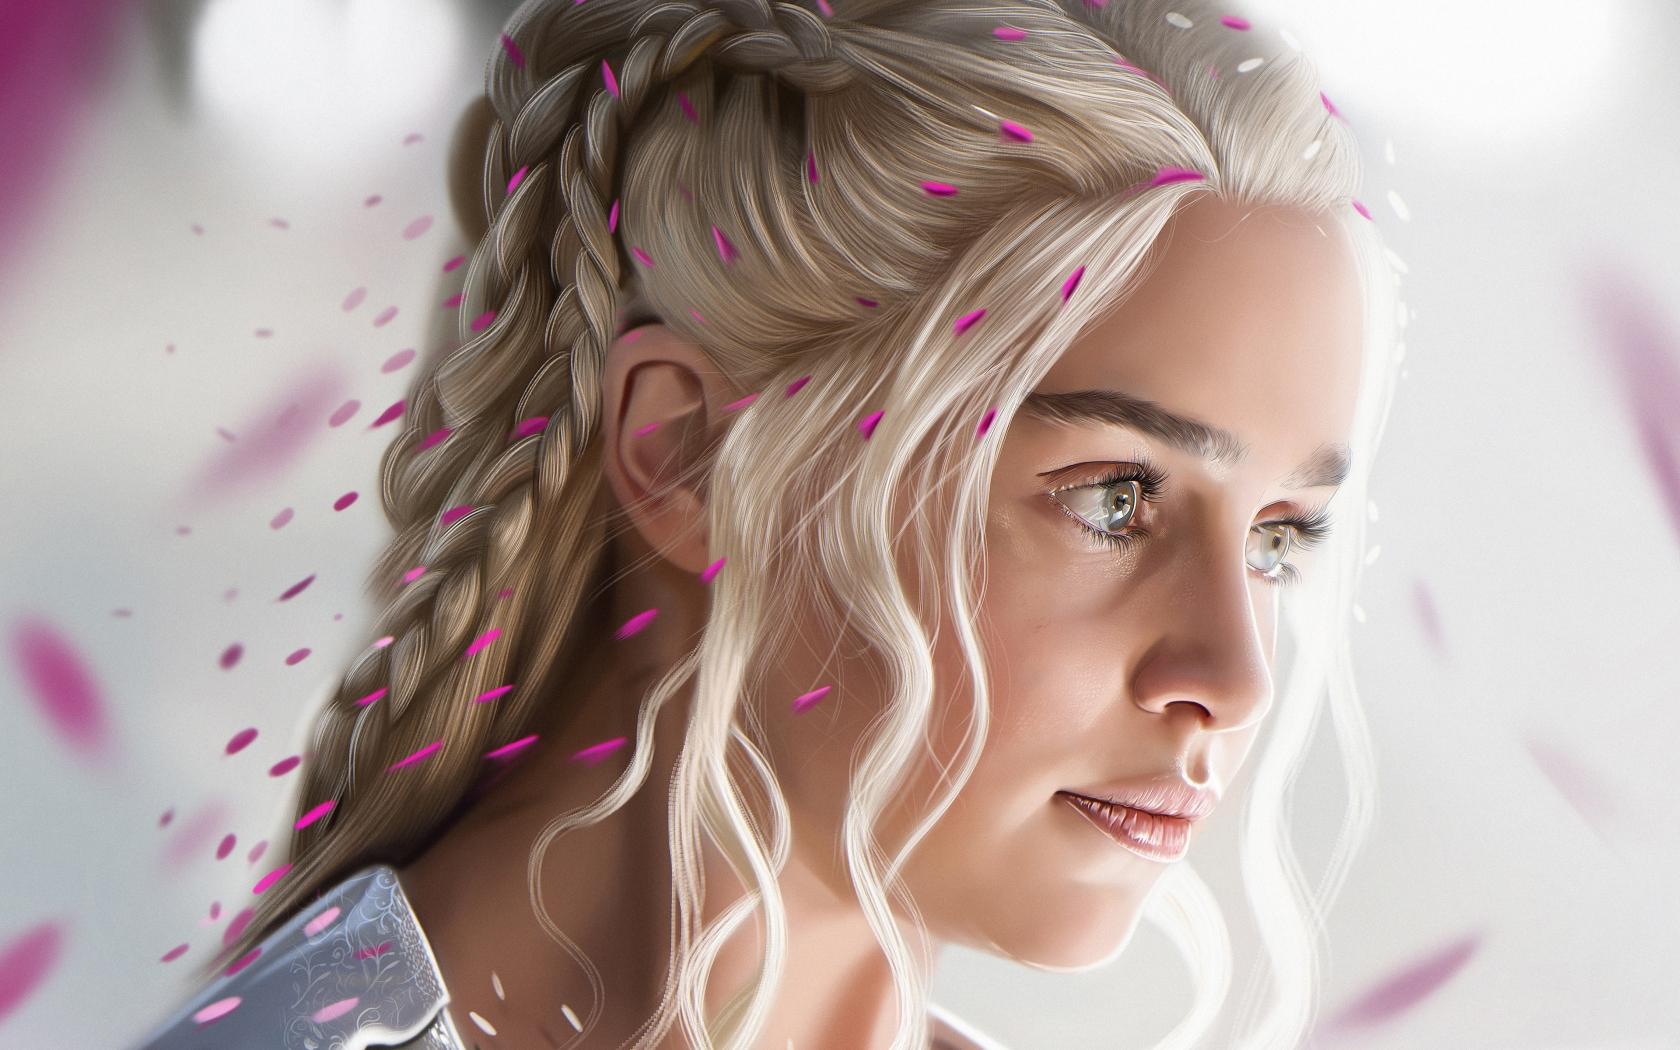 El rostro de Daenerys Targaryan - 1680x1050